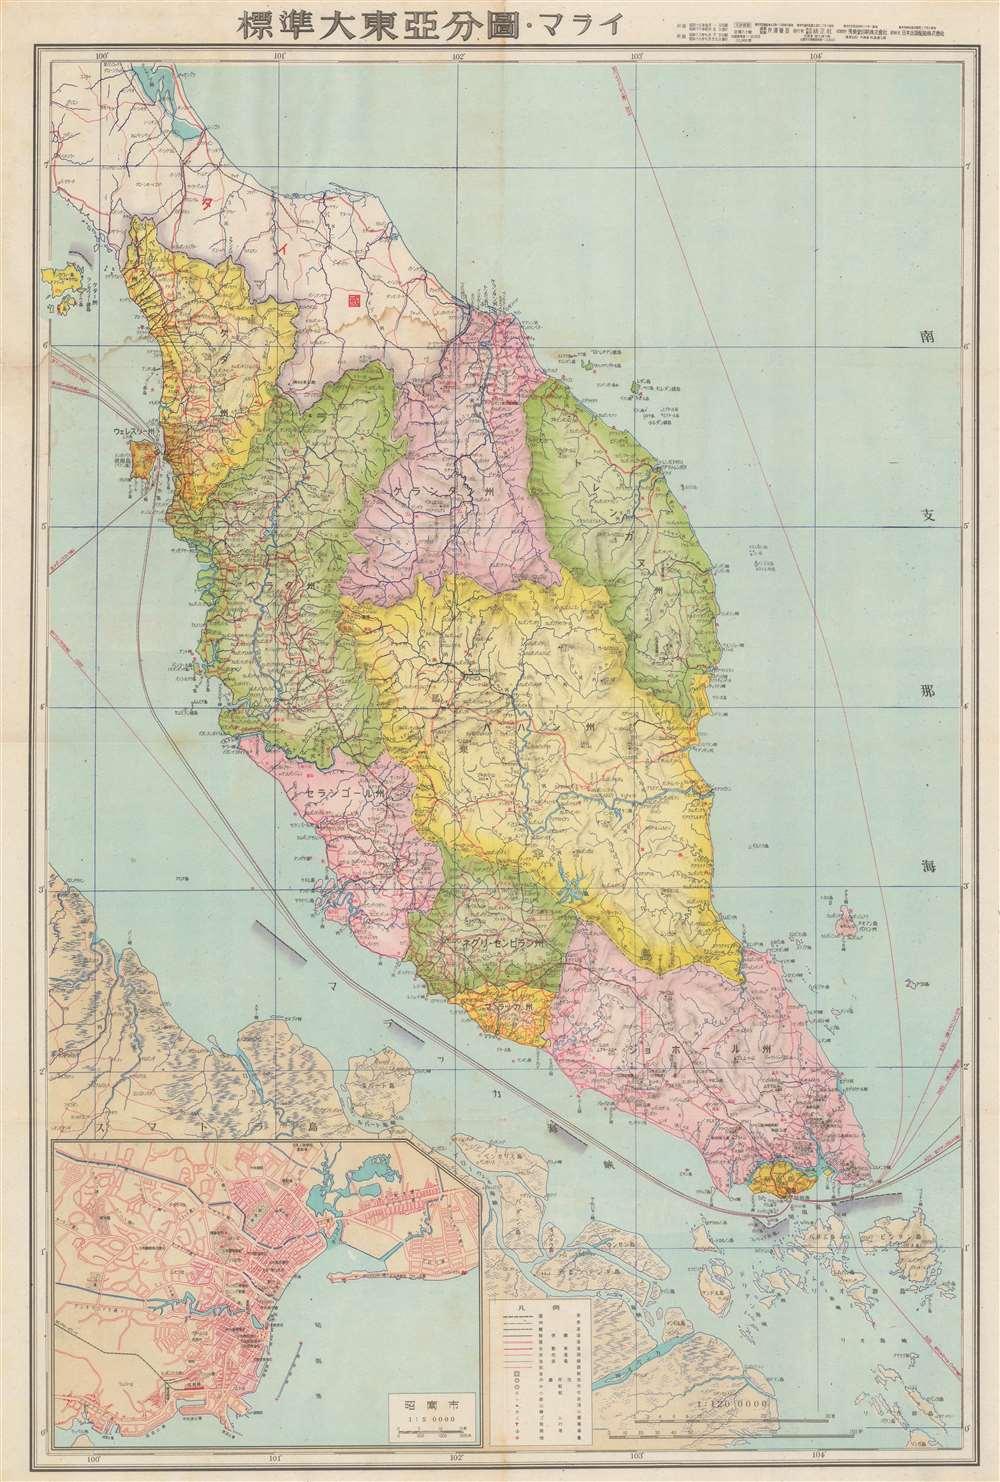 1943 or Showa 18 WWII Japanese Map of the Malay Peninsula w/ Singapore